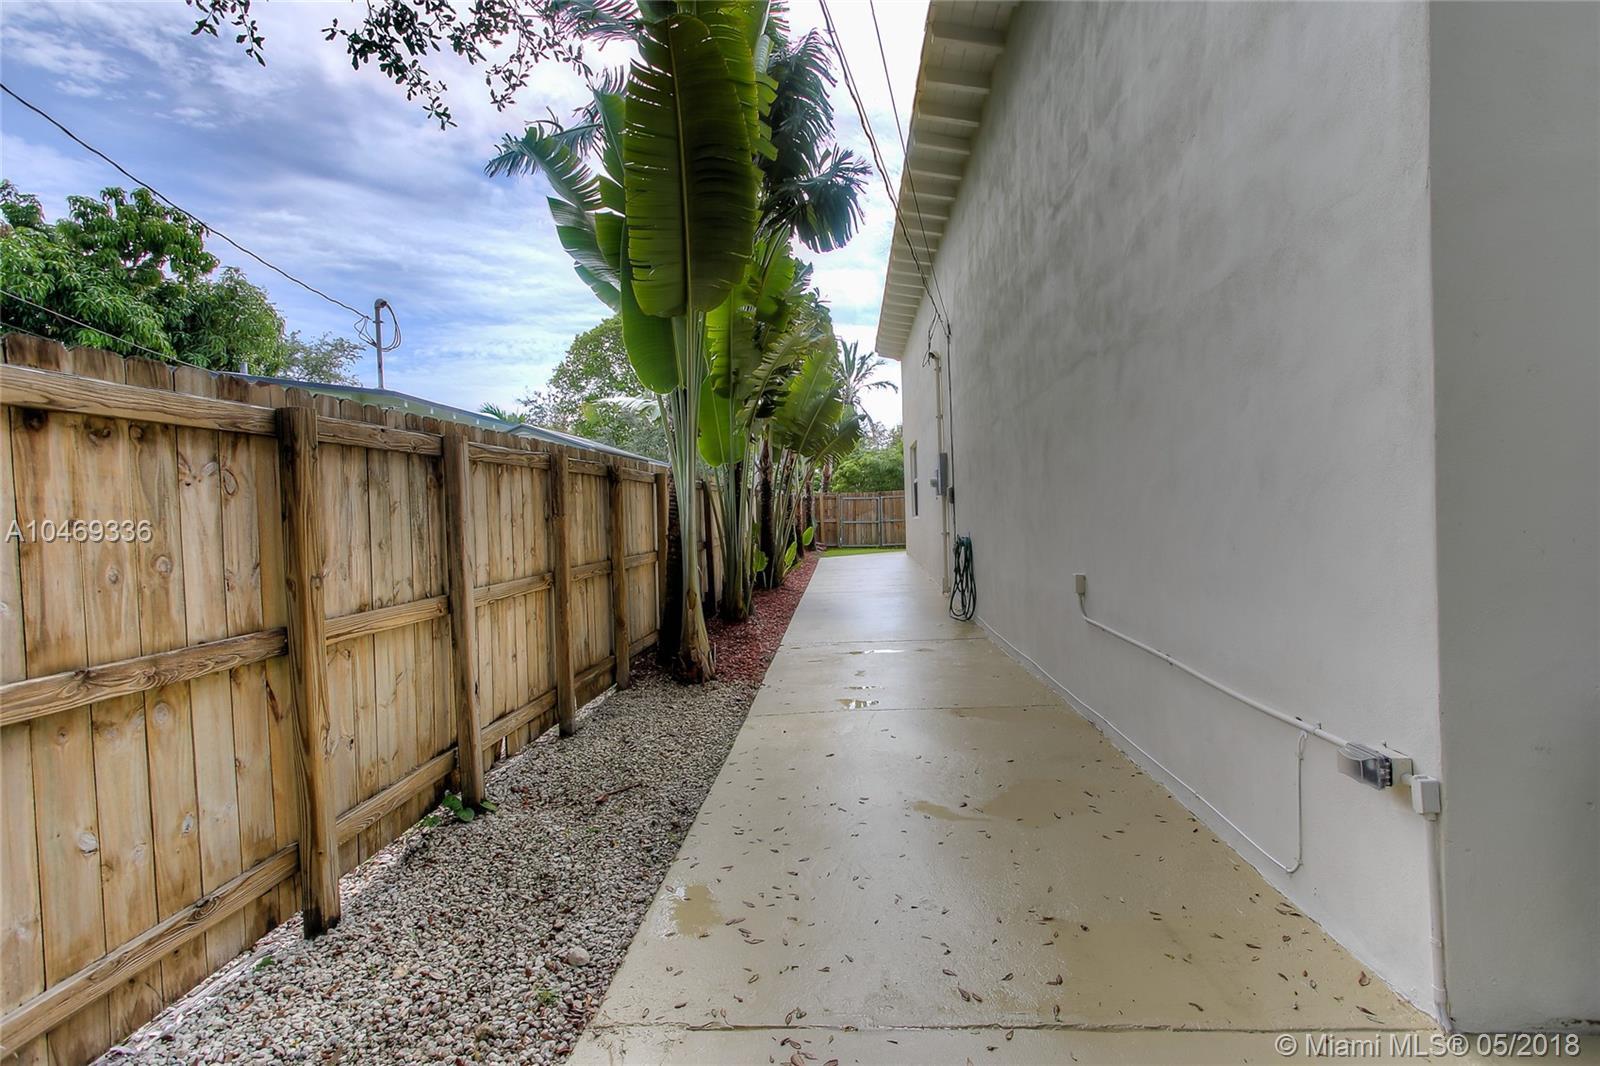 6730 Sw 63rd Ave, South Miami FL, 33143